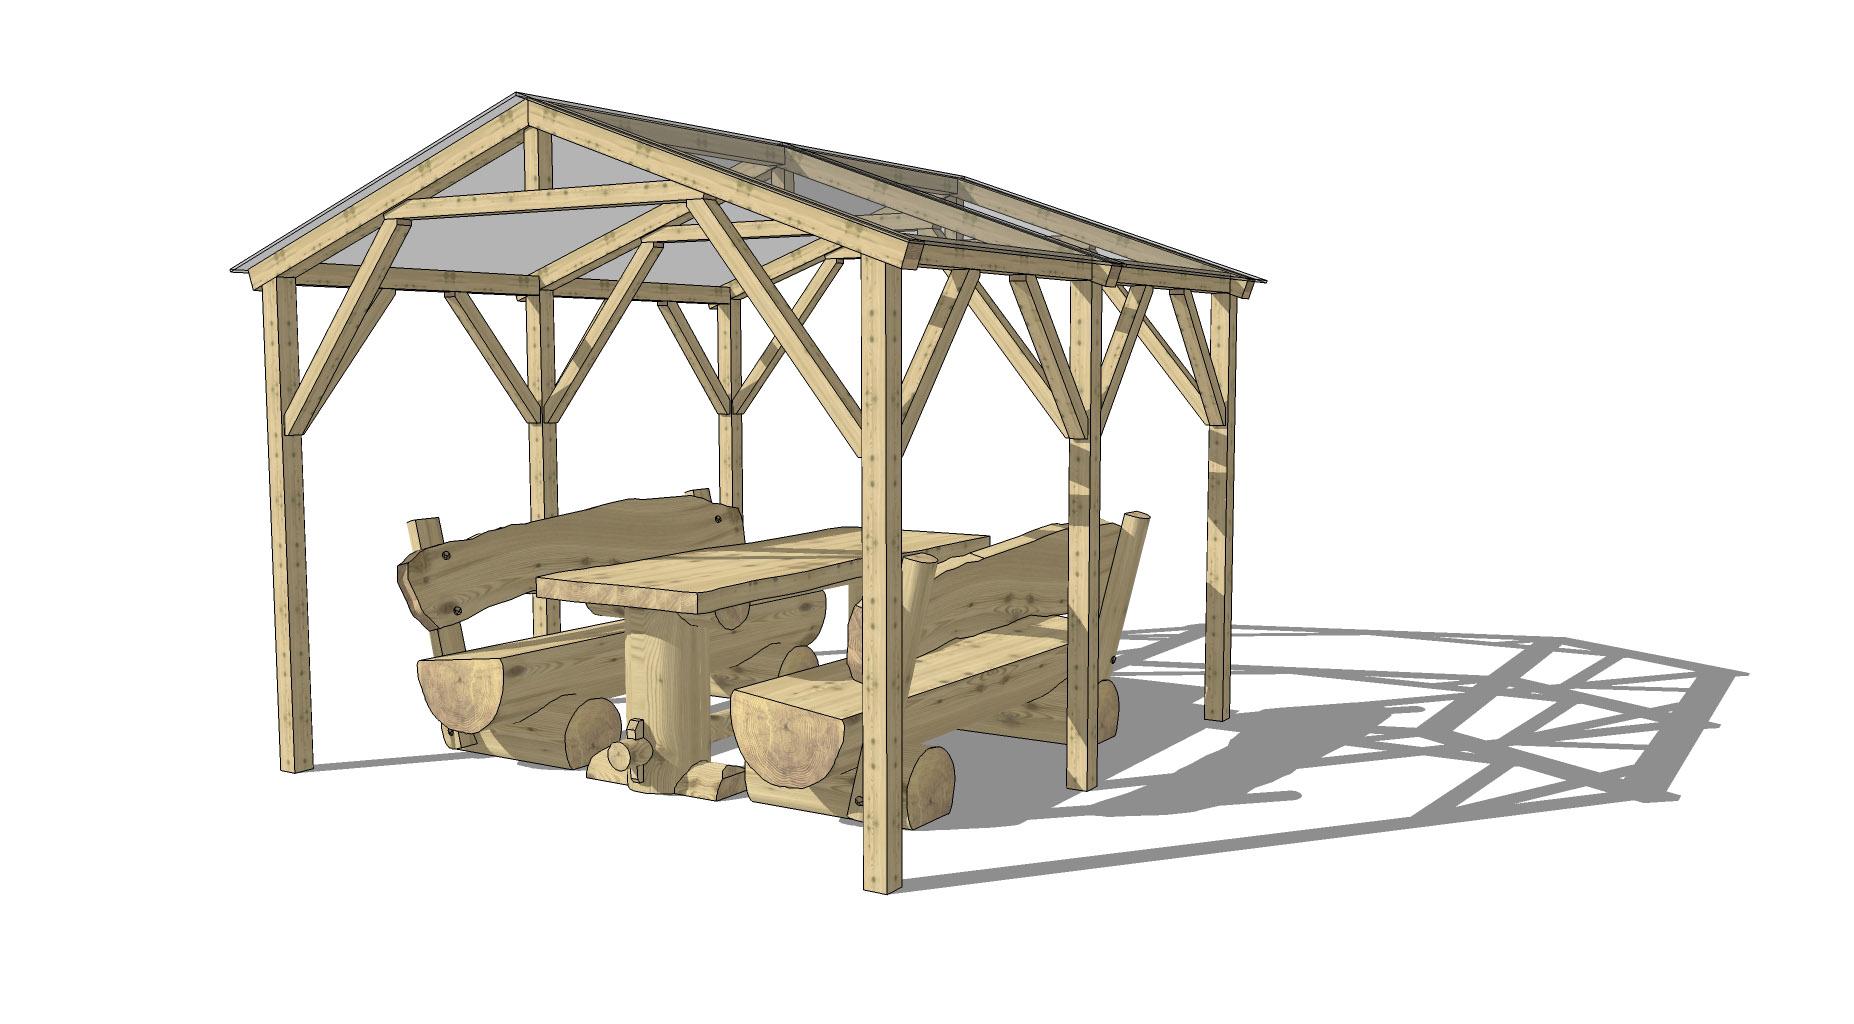 Copertura tradizionale ferrari carpenteria case in legno for Casa in legno tradizionale